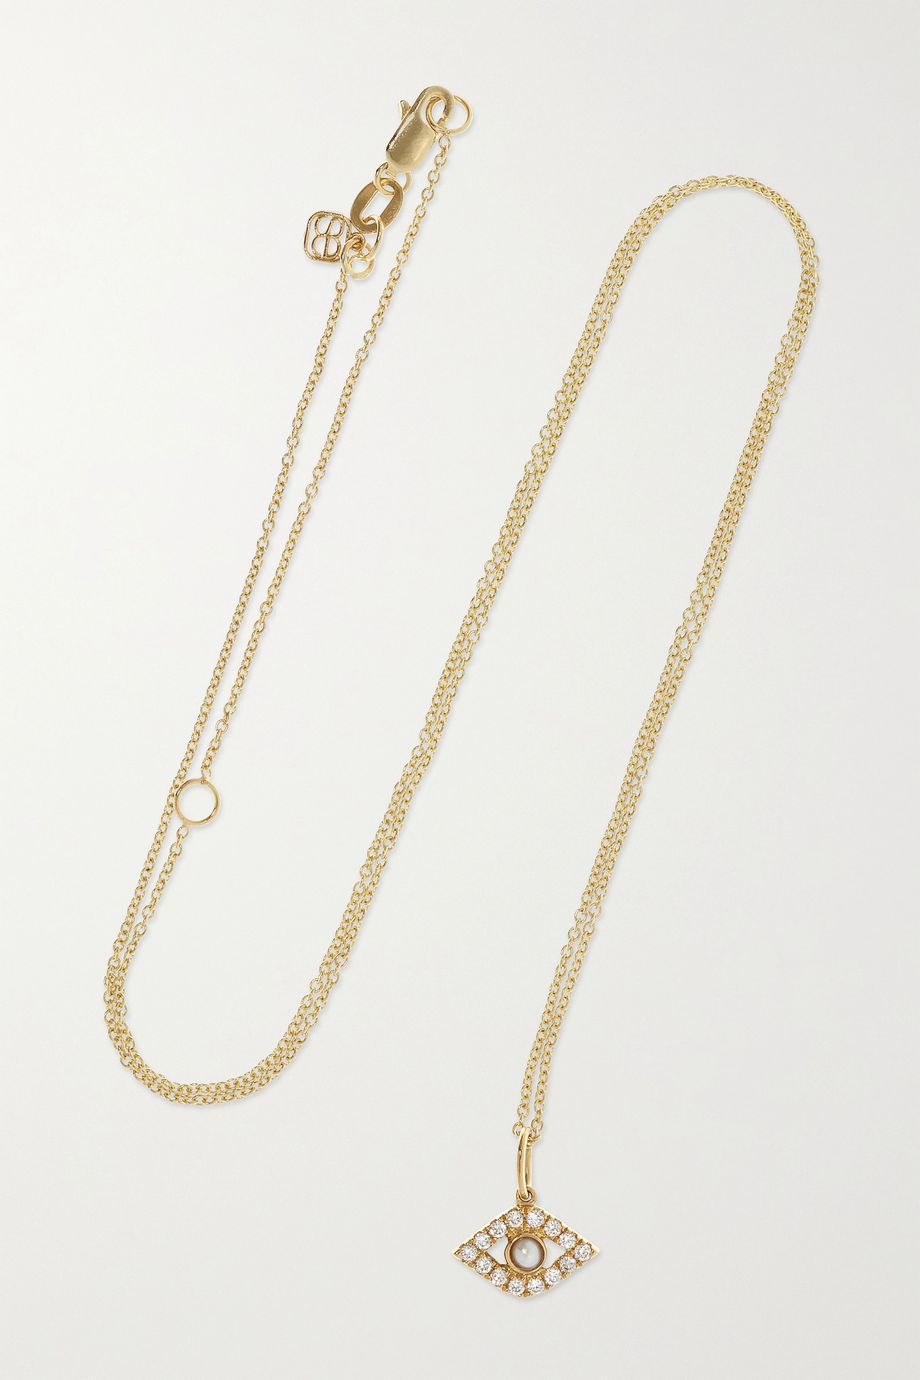 Sydney Evan 14-karat gold, diamond and pearl necklace